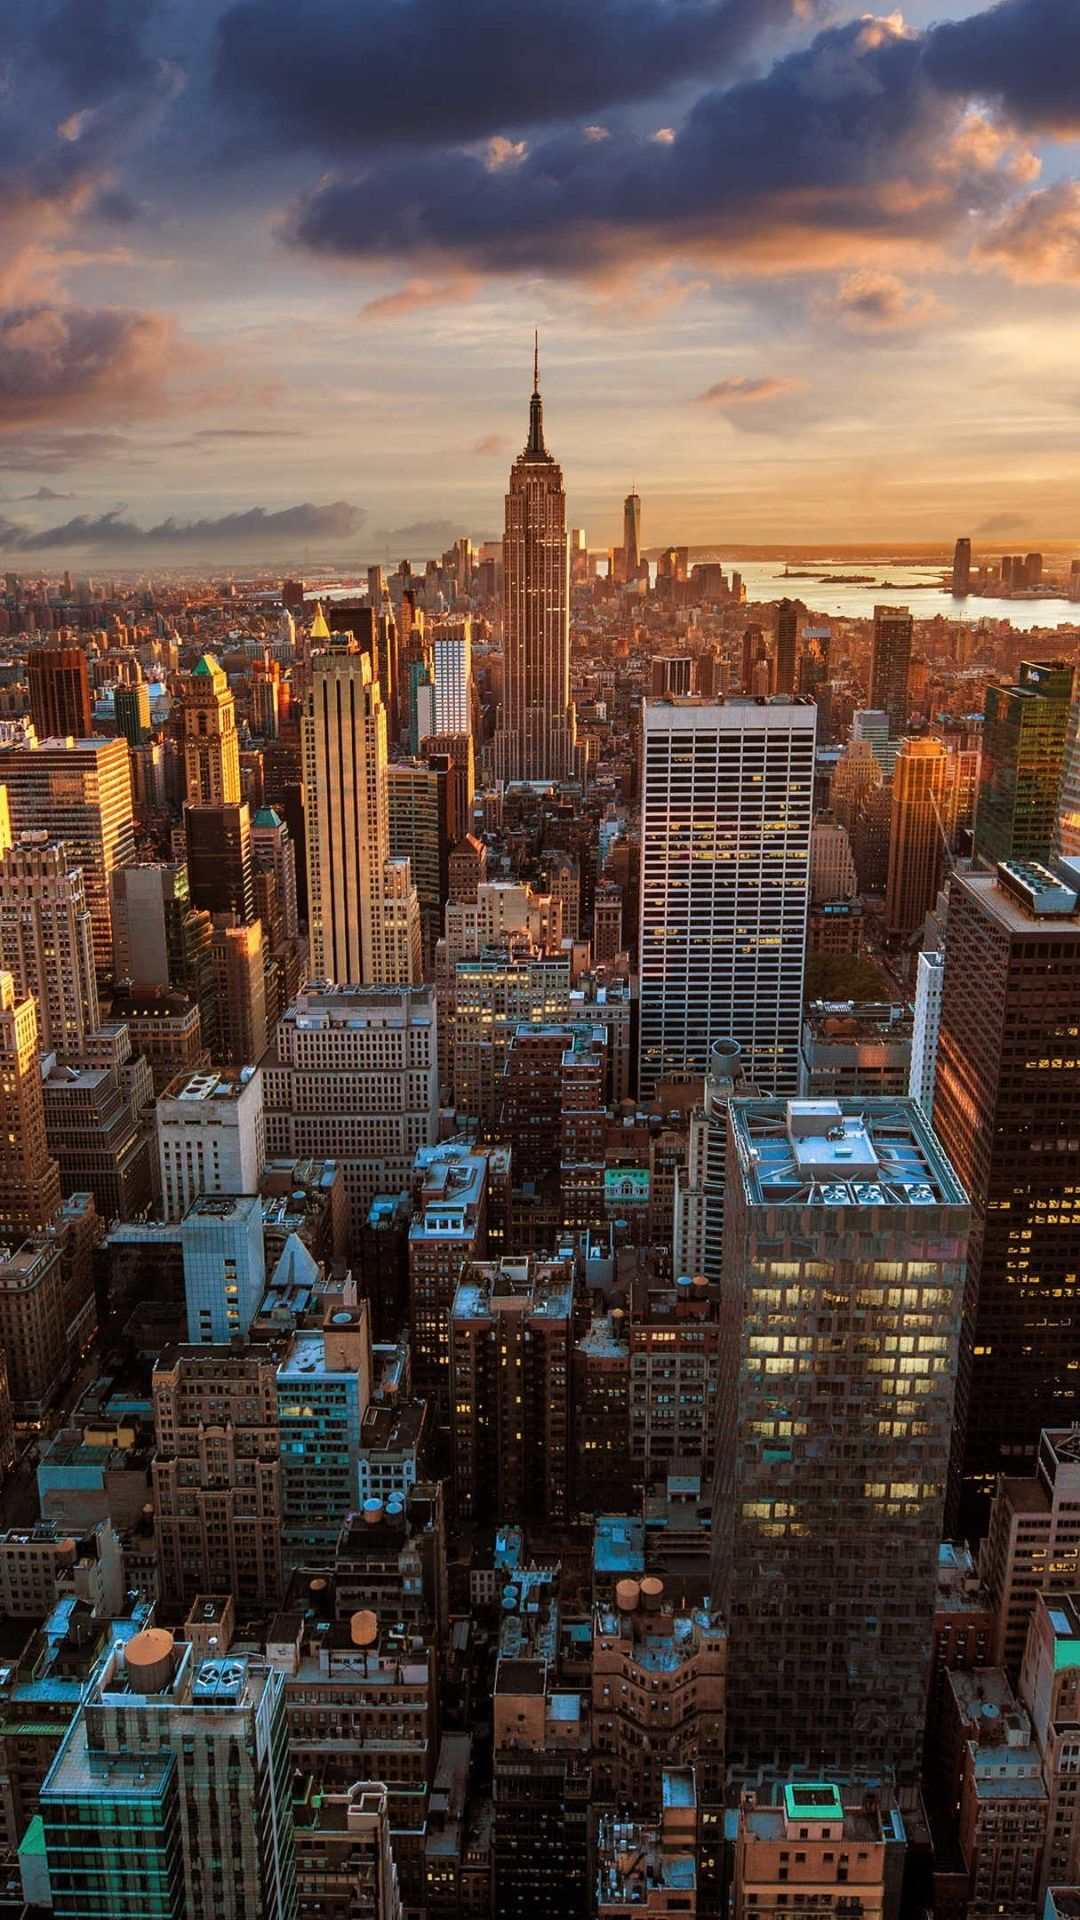 1080x1920 4k city wallpaper New york wallpaper, City